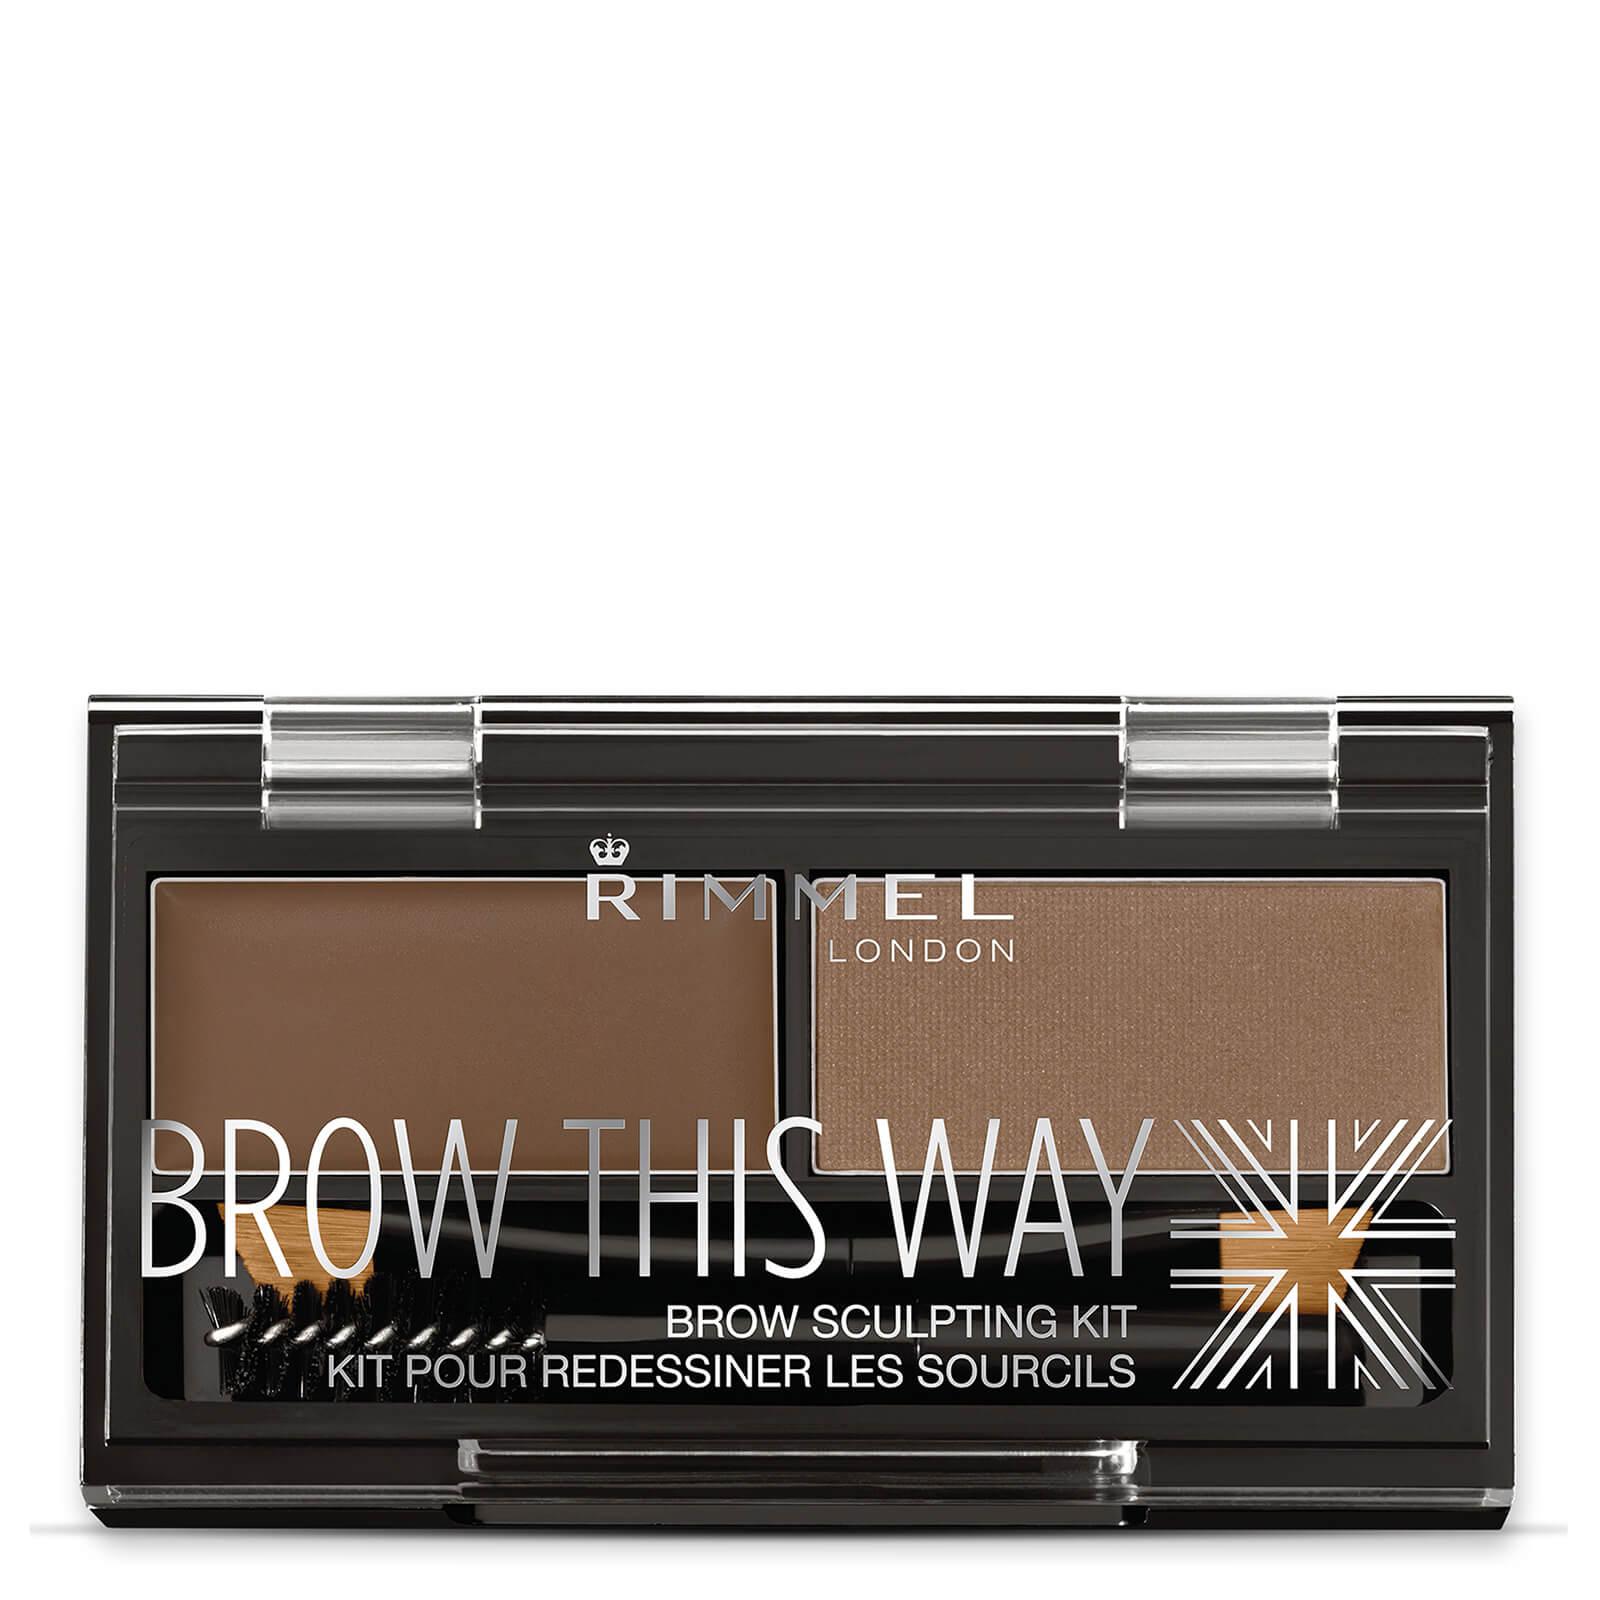 c9c85b2f4c4 Rimmel Brow This Way Eyebrow Kit - Medium Brown   Free Shipping    Lookfantastic